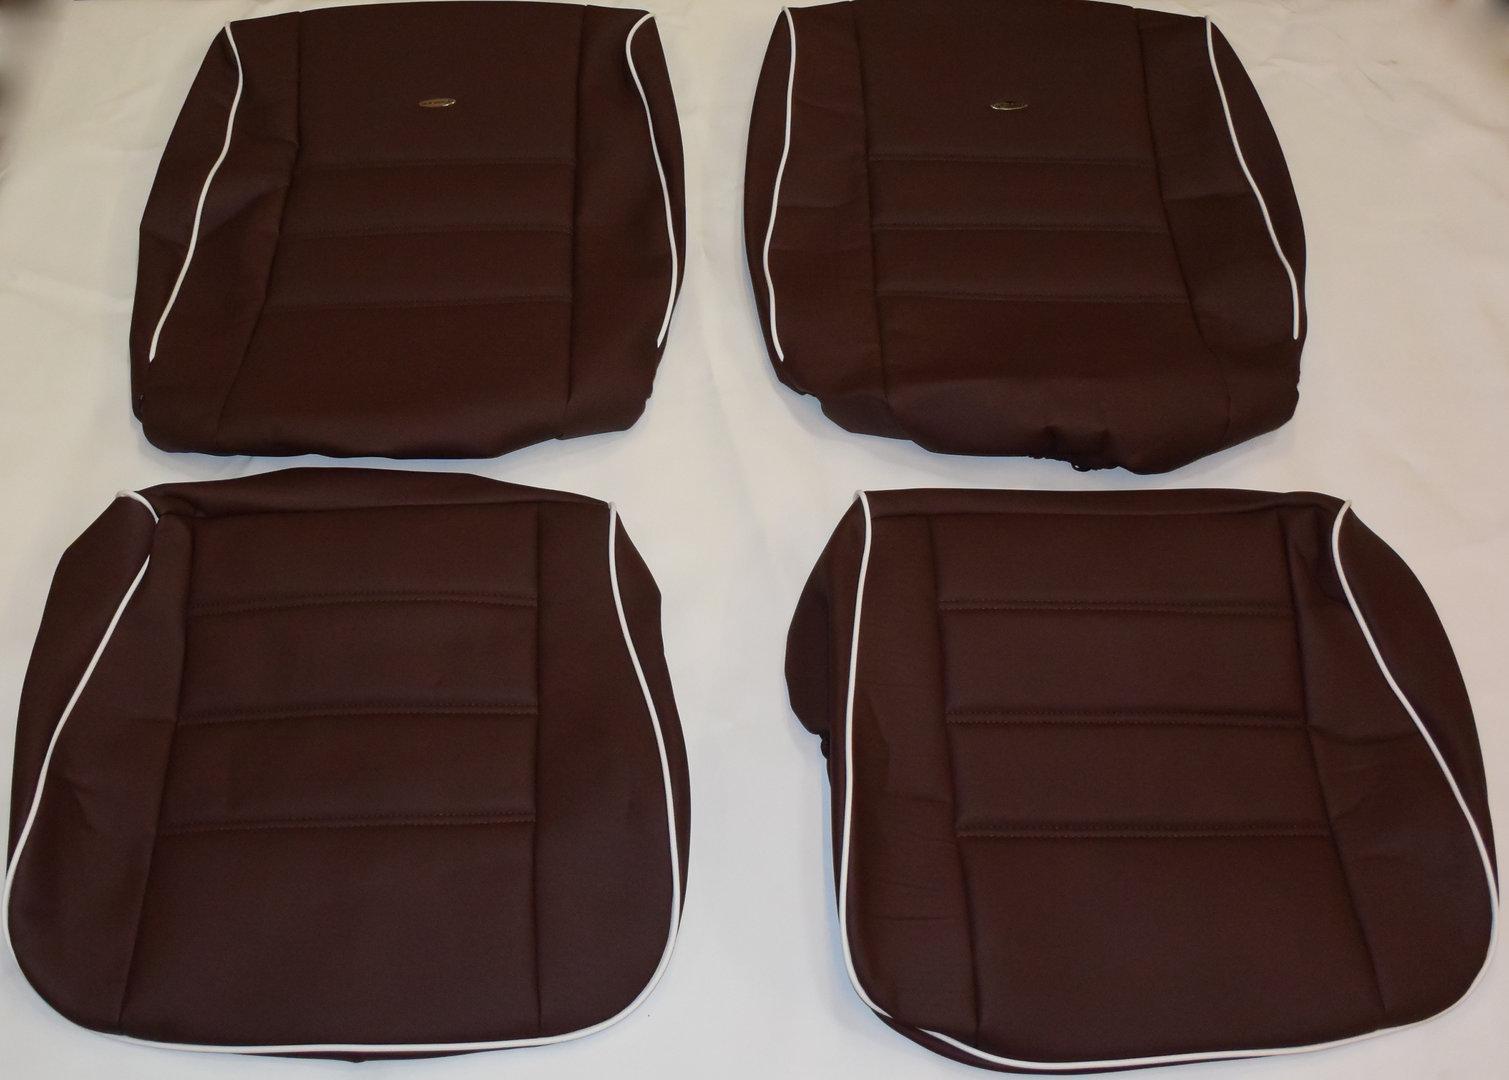 vw beetle limousine 08 64 07 67 custom seat covers in bordeaux. Black Bedroom Furniture Sets. Home Design Ideas